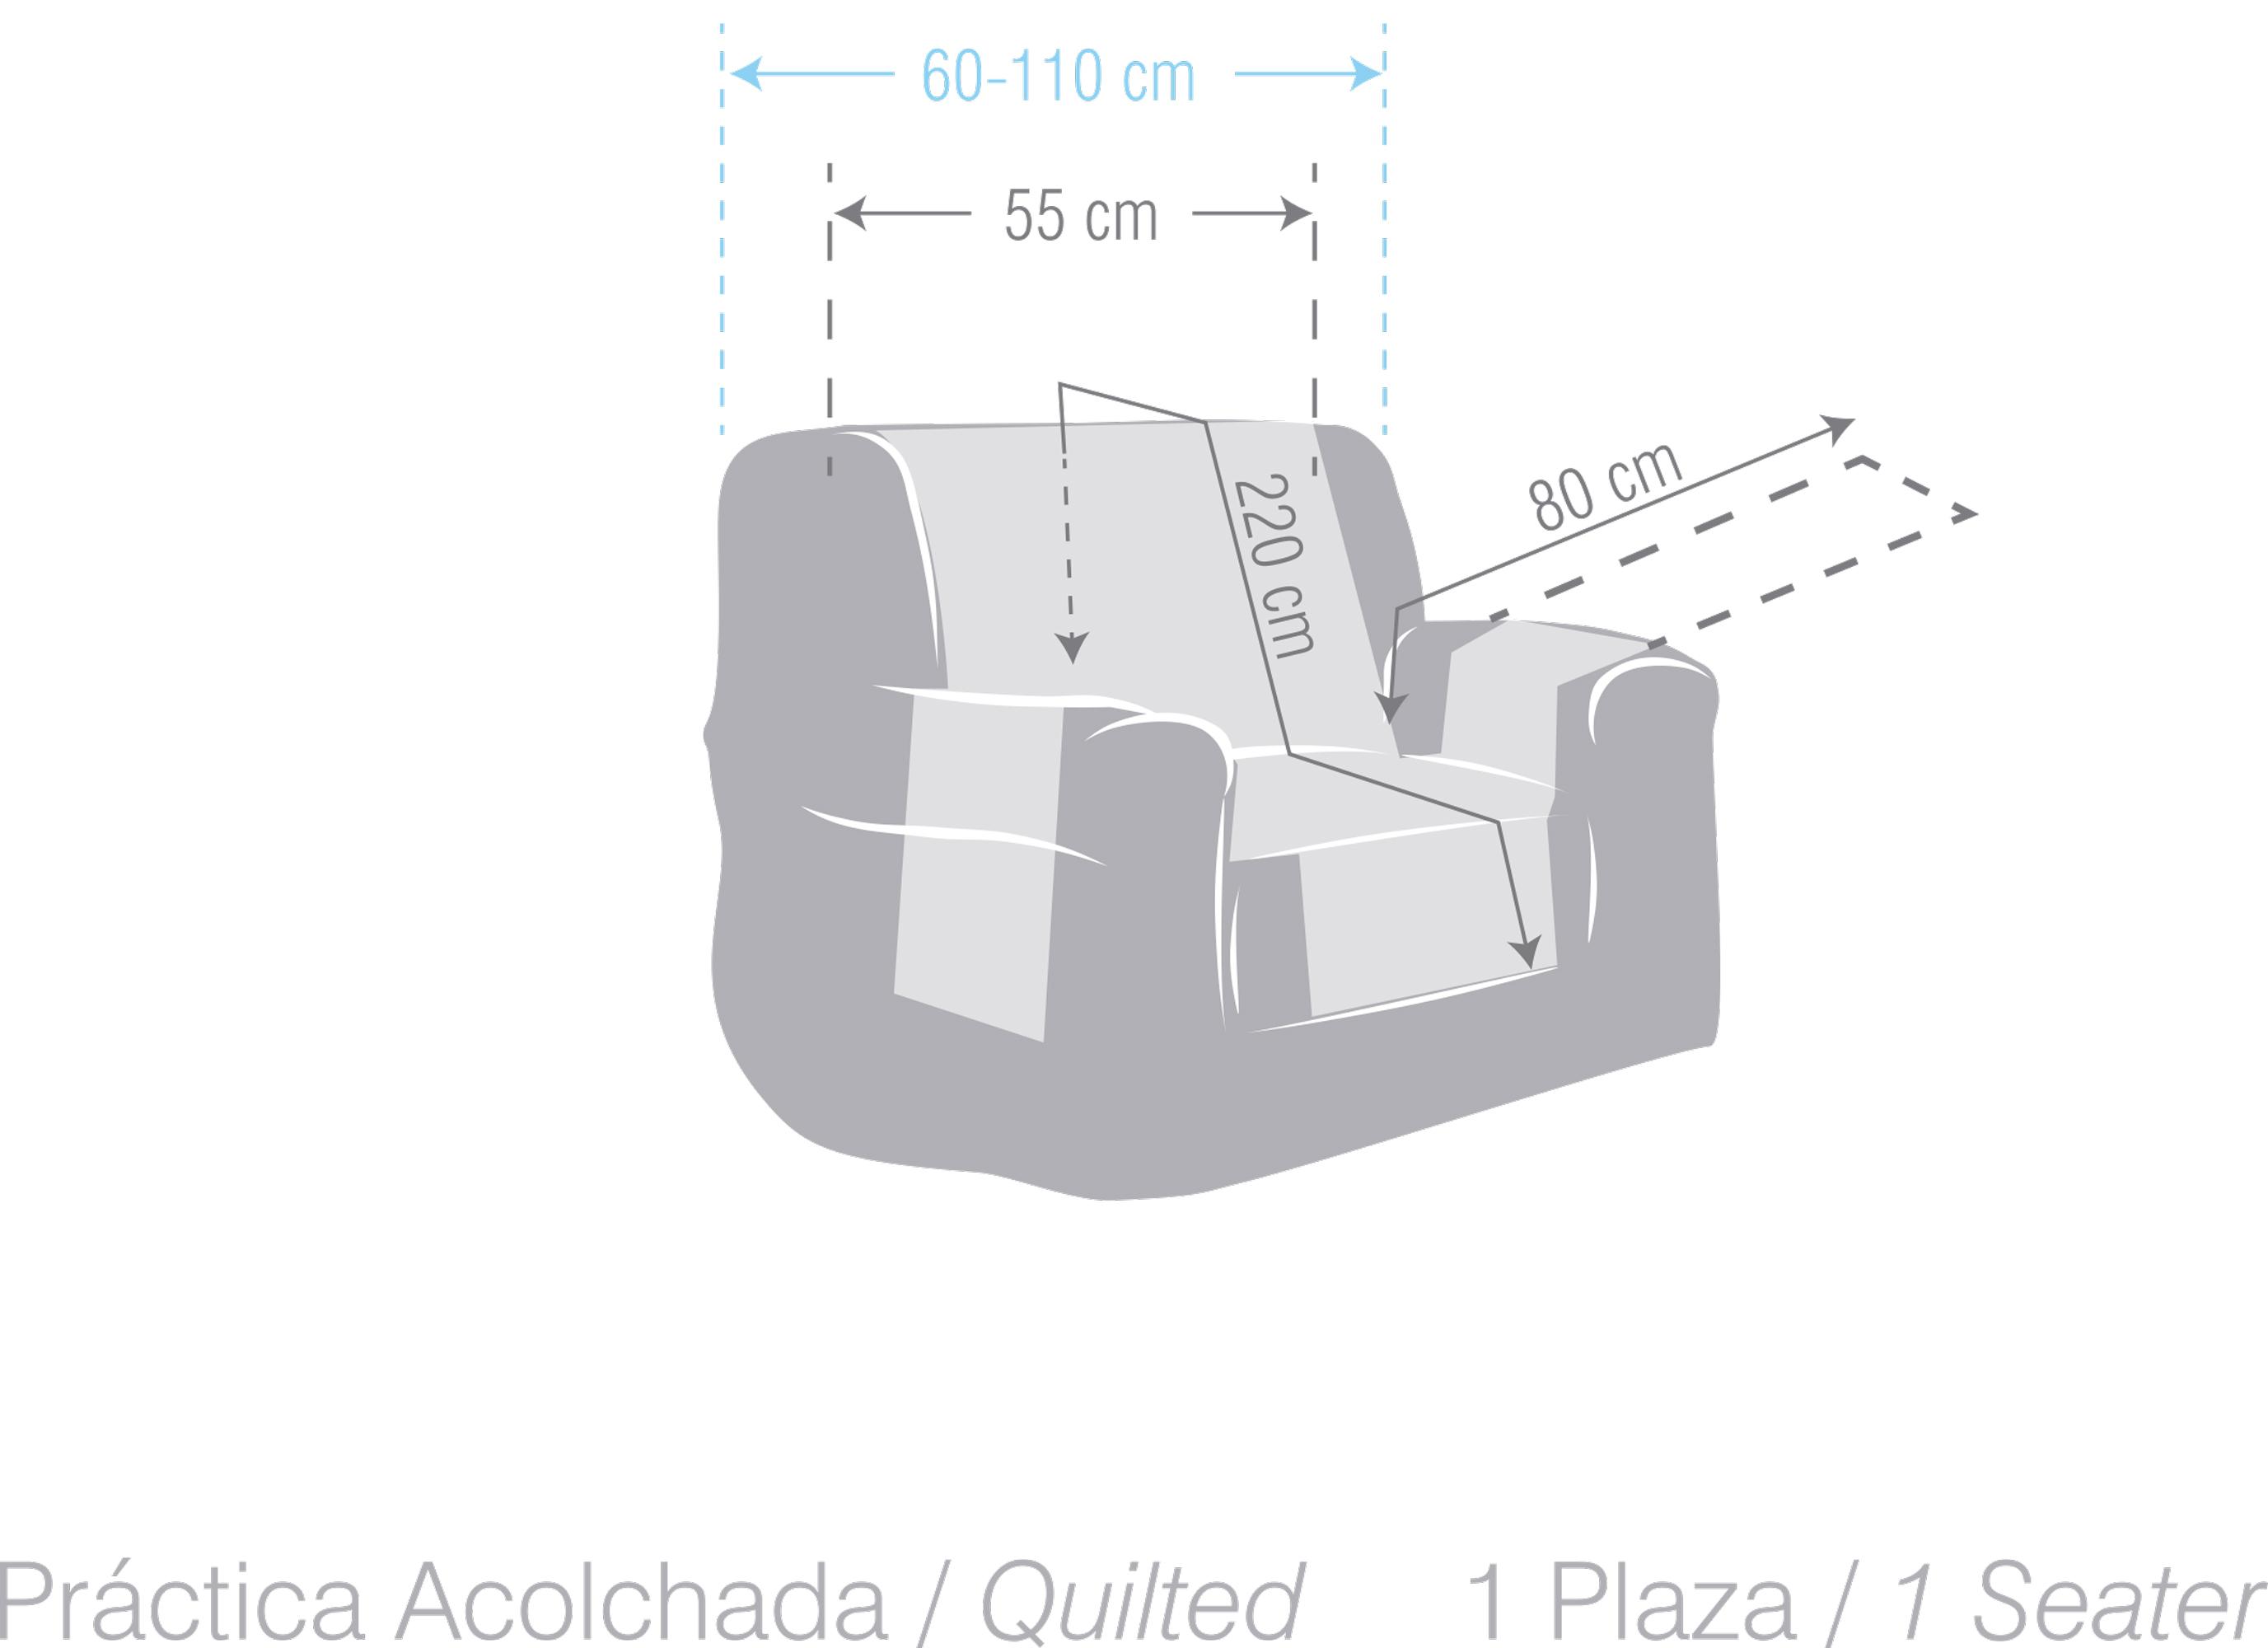 F_PRACTICA-ACOLCHADA-1-PLAZA.jpg